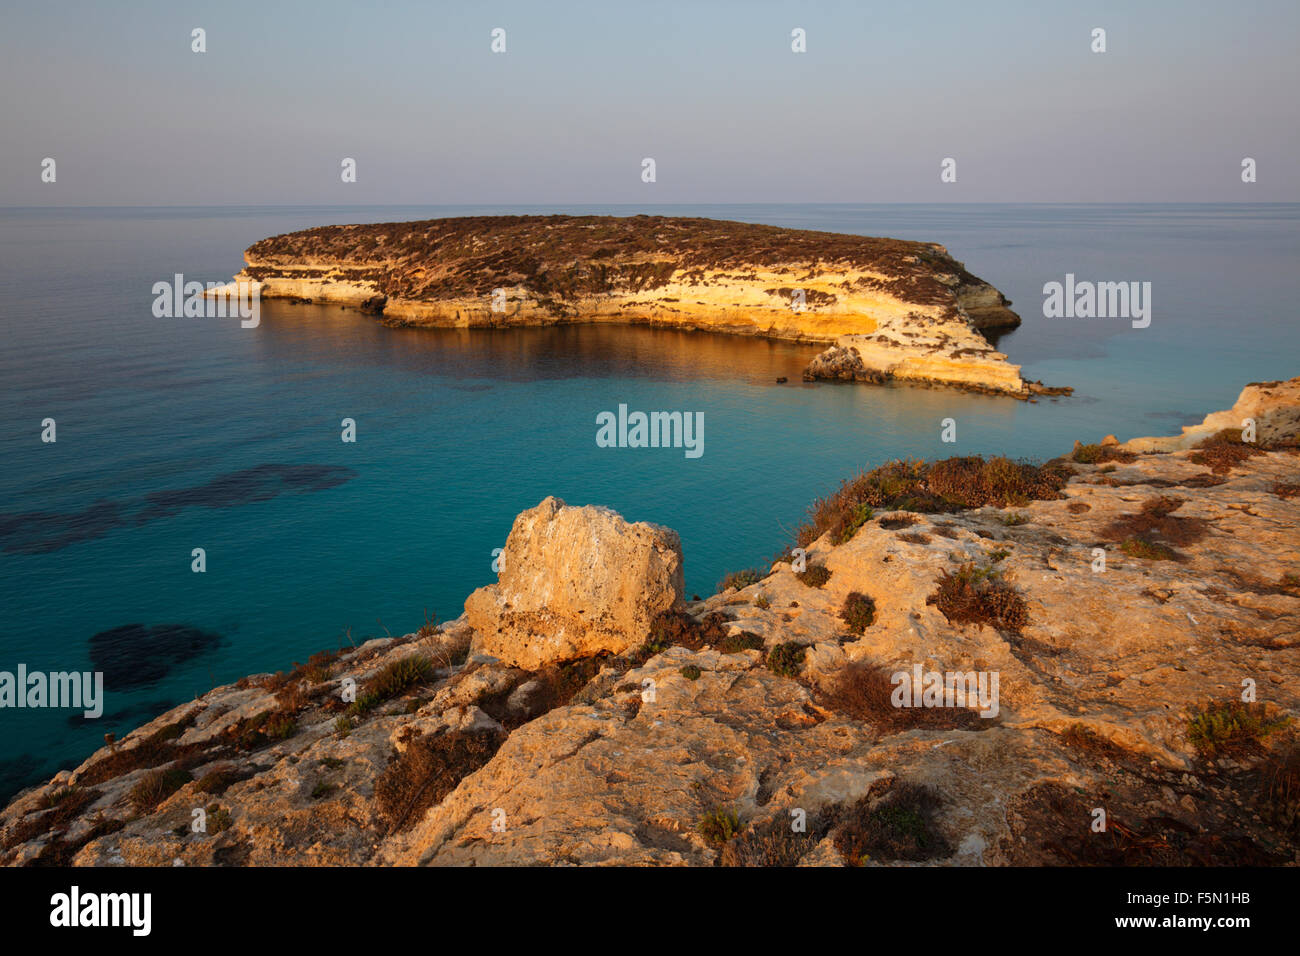 Insel der Kaninchen in Lampedusa, Sizilien, Italien Stockbild